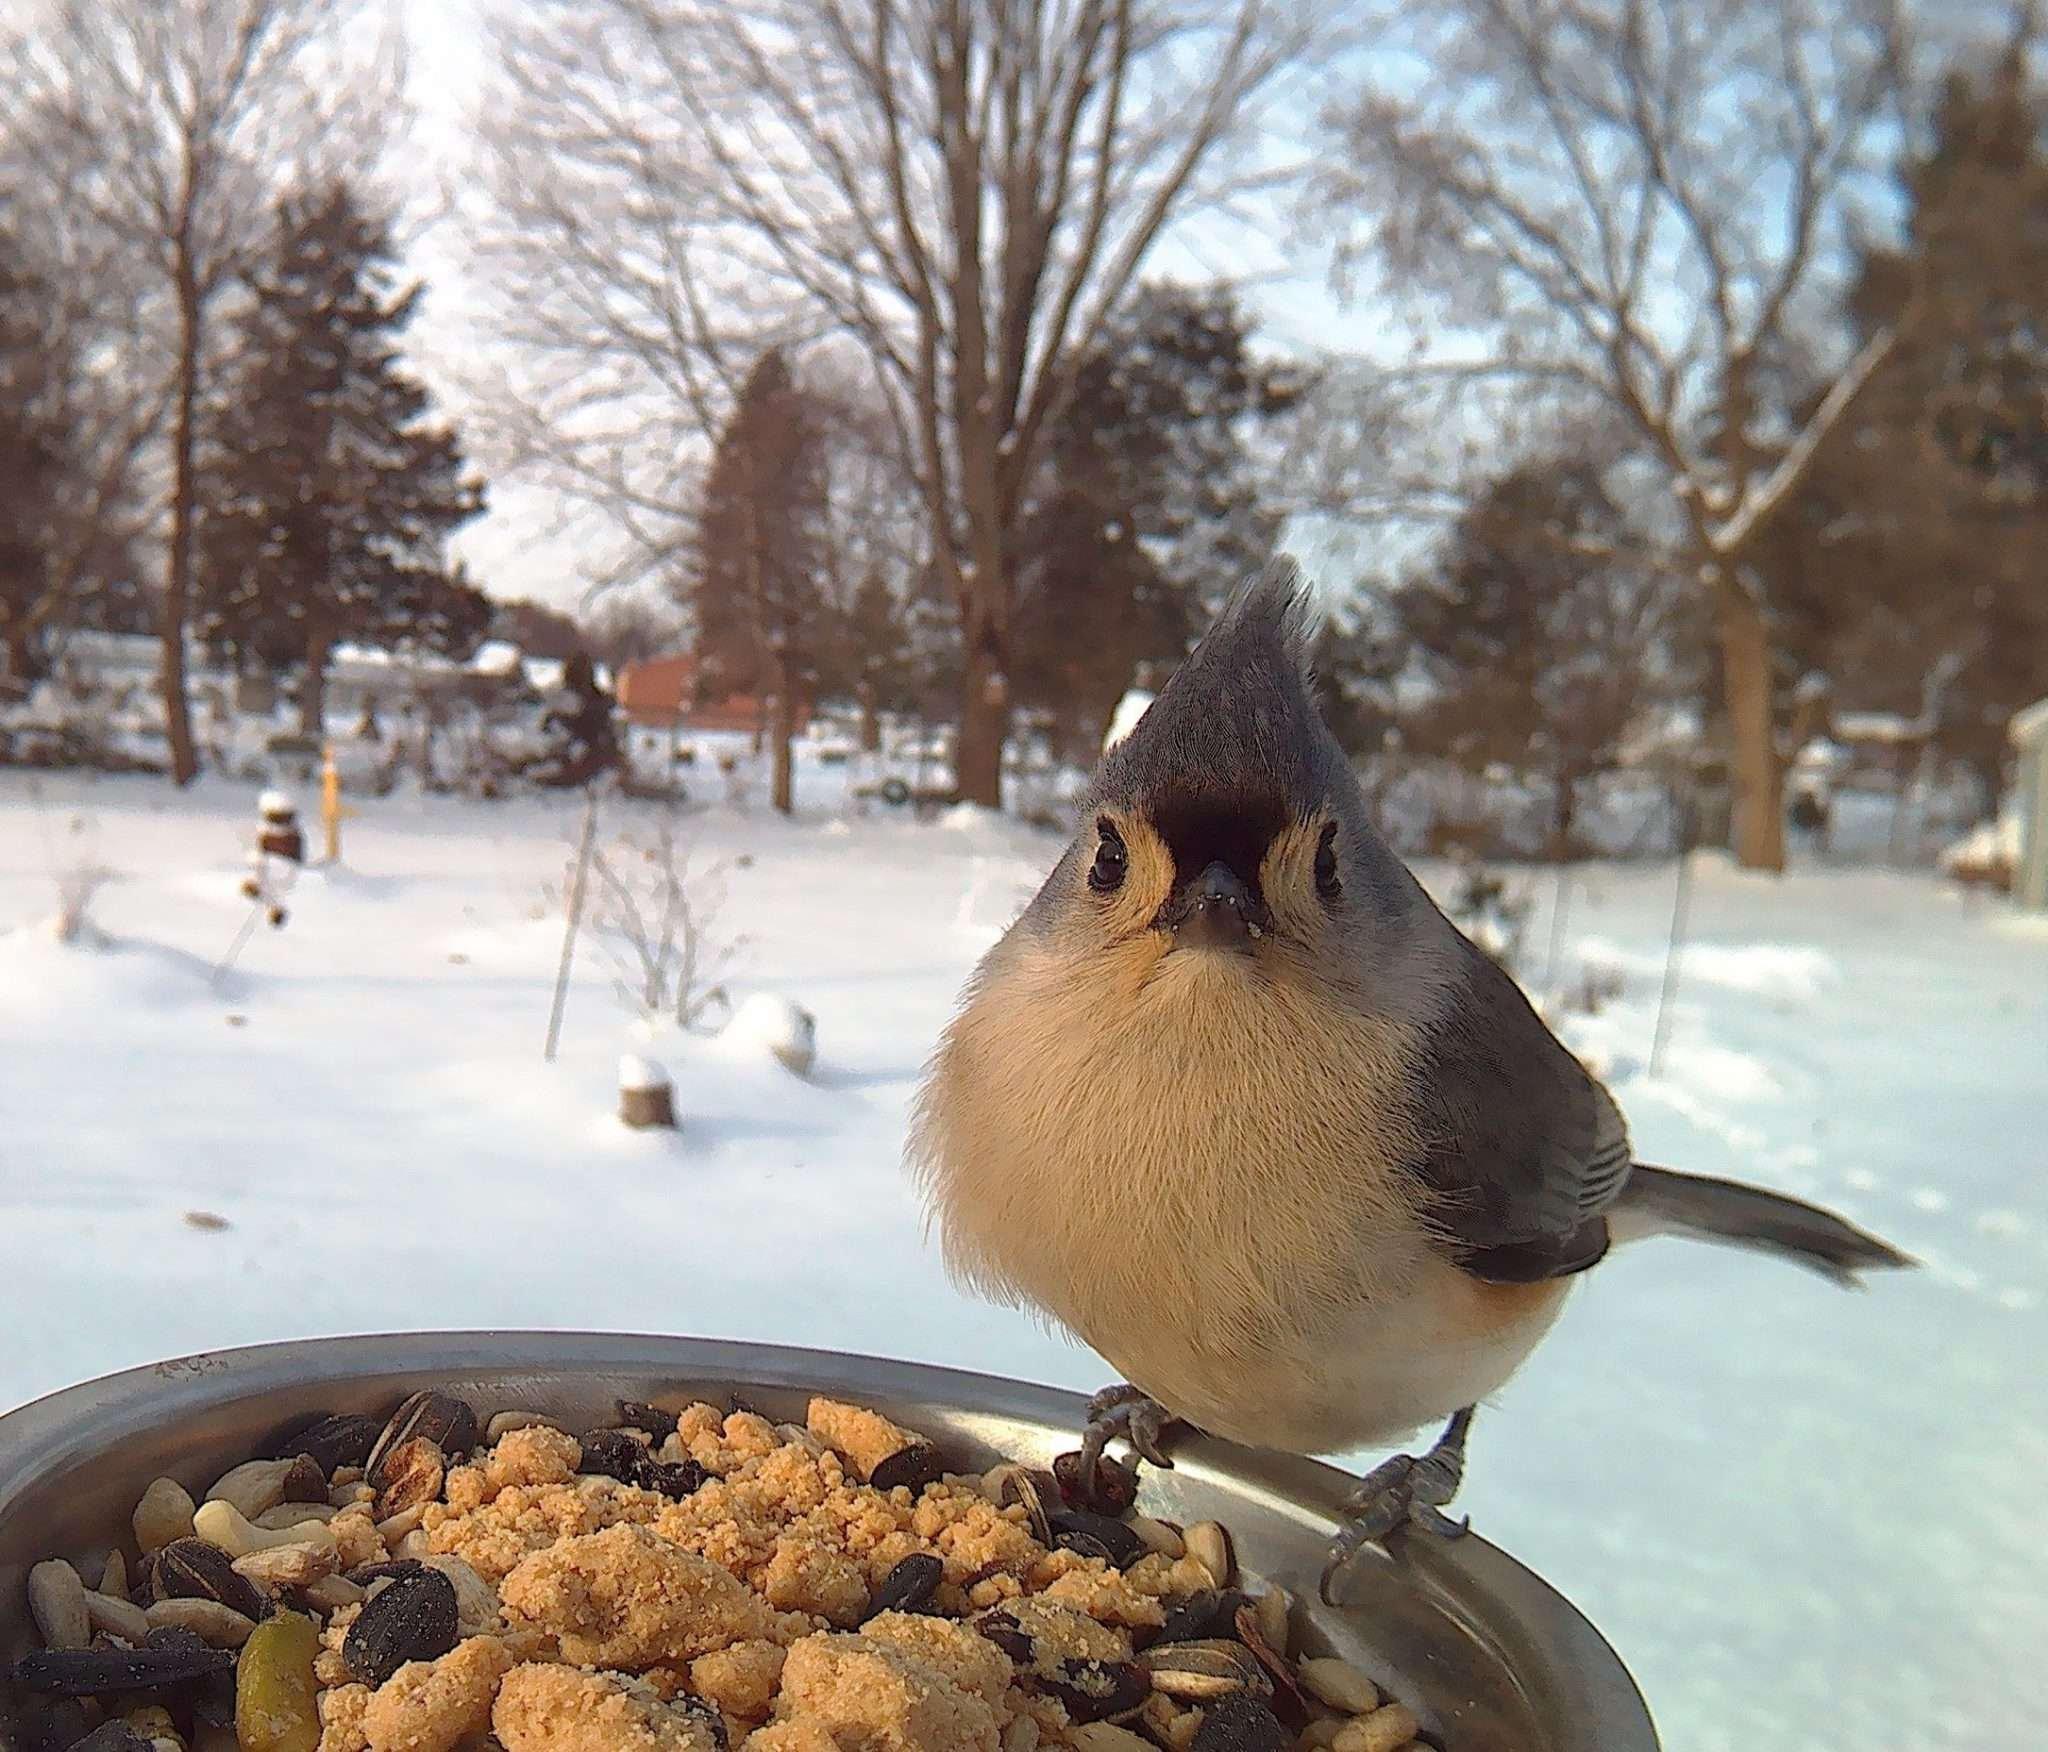 коржи покормить птицу картинка мальчику было